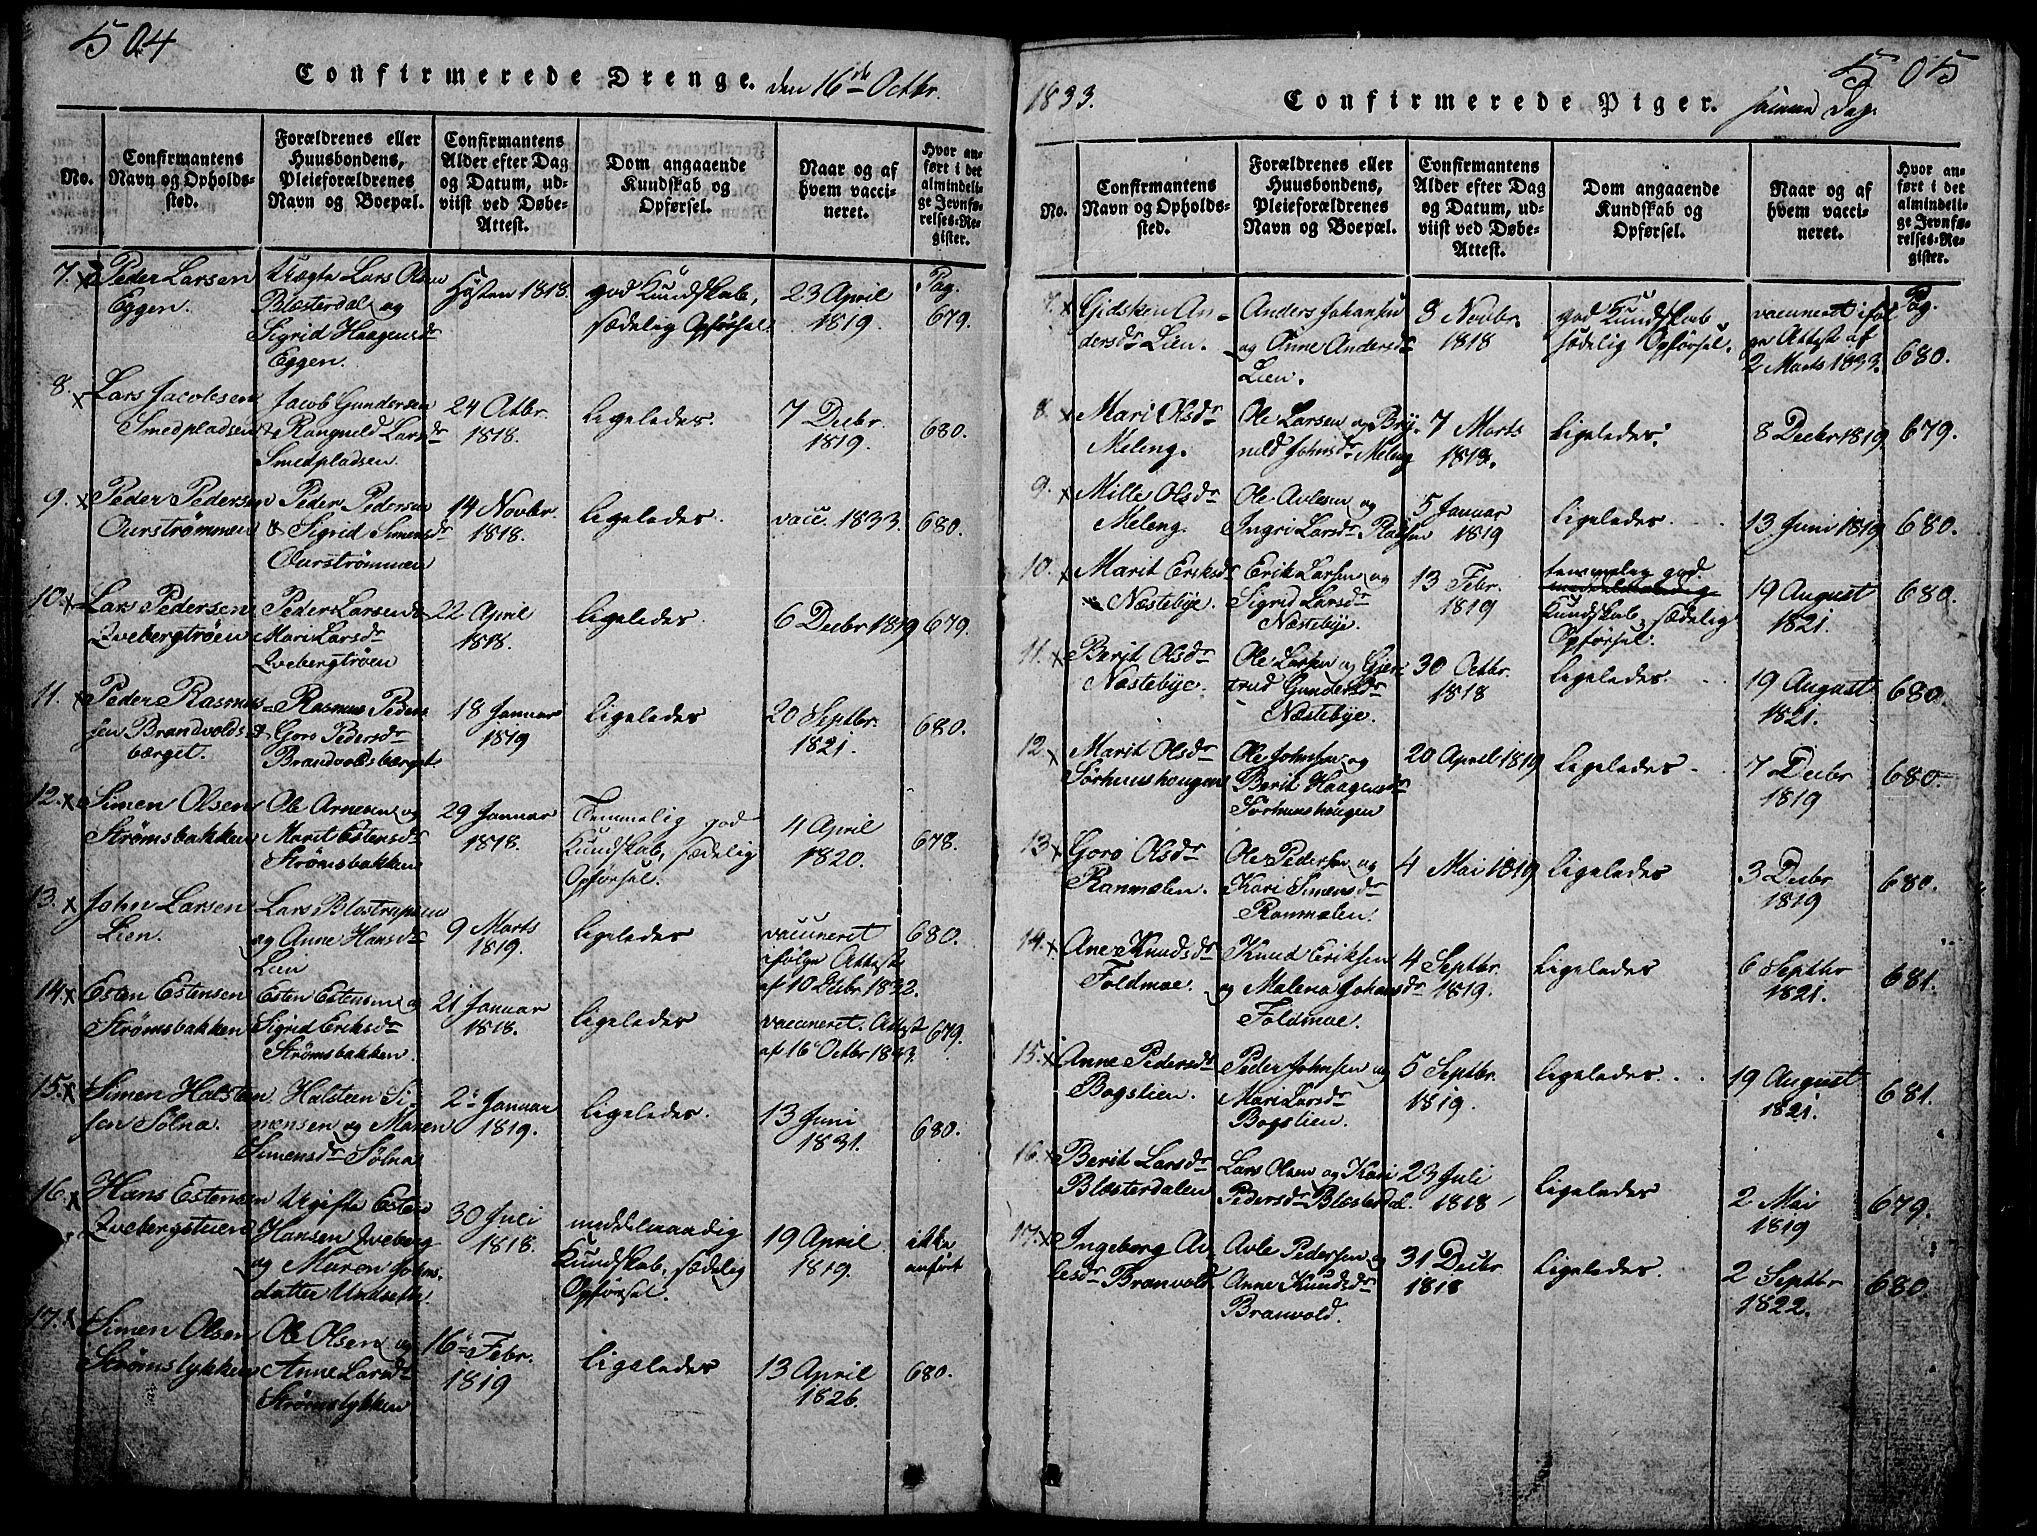 SAH, Tynset prestekontor, Klokkerbok nr. 2, 1814-1862, s. 504-505